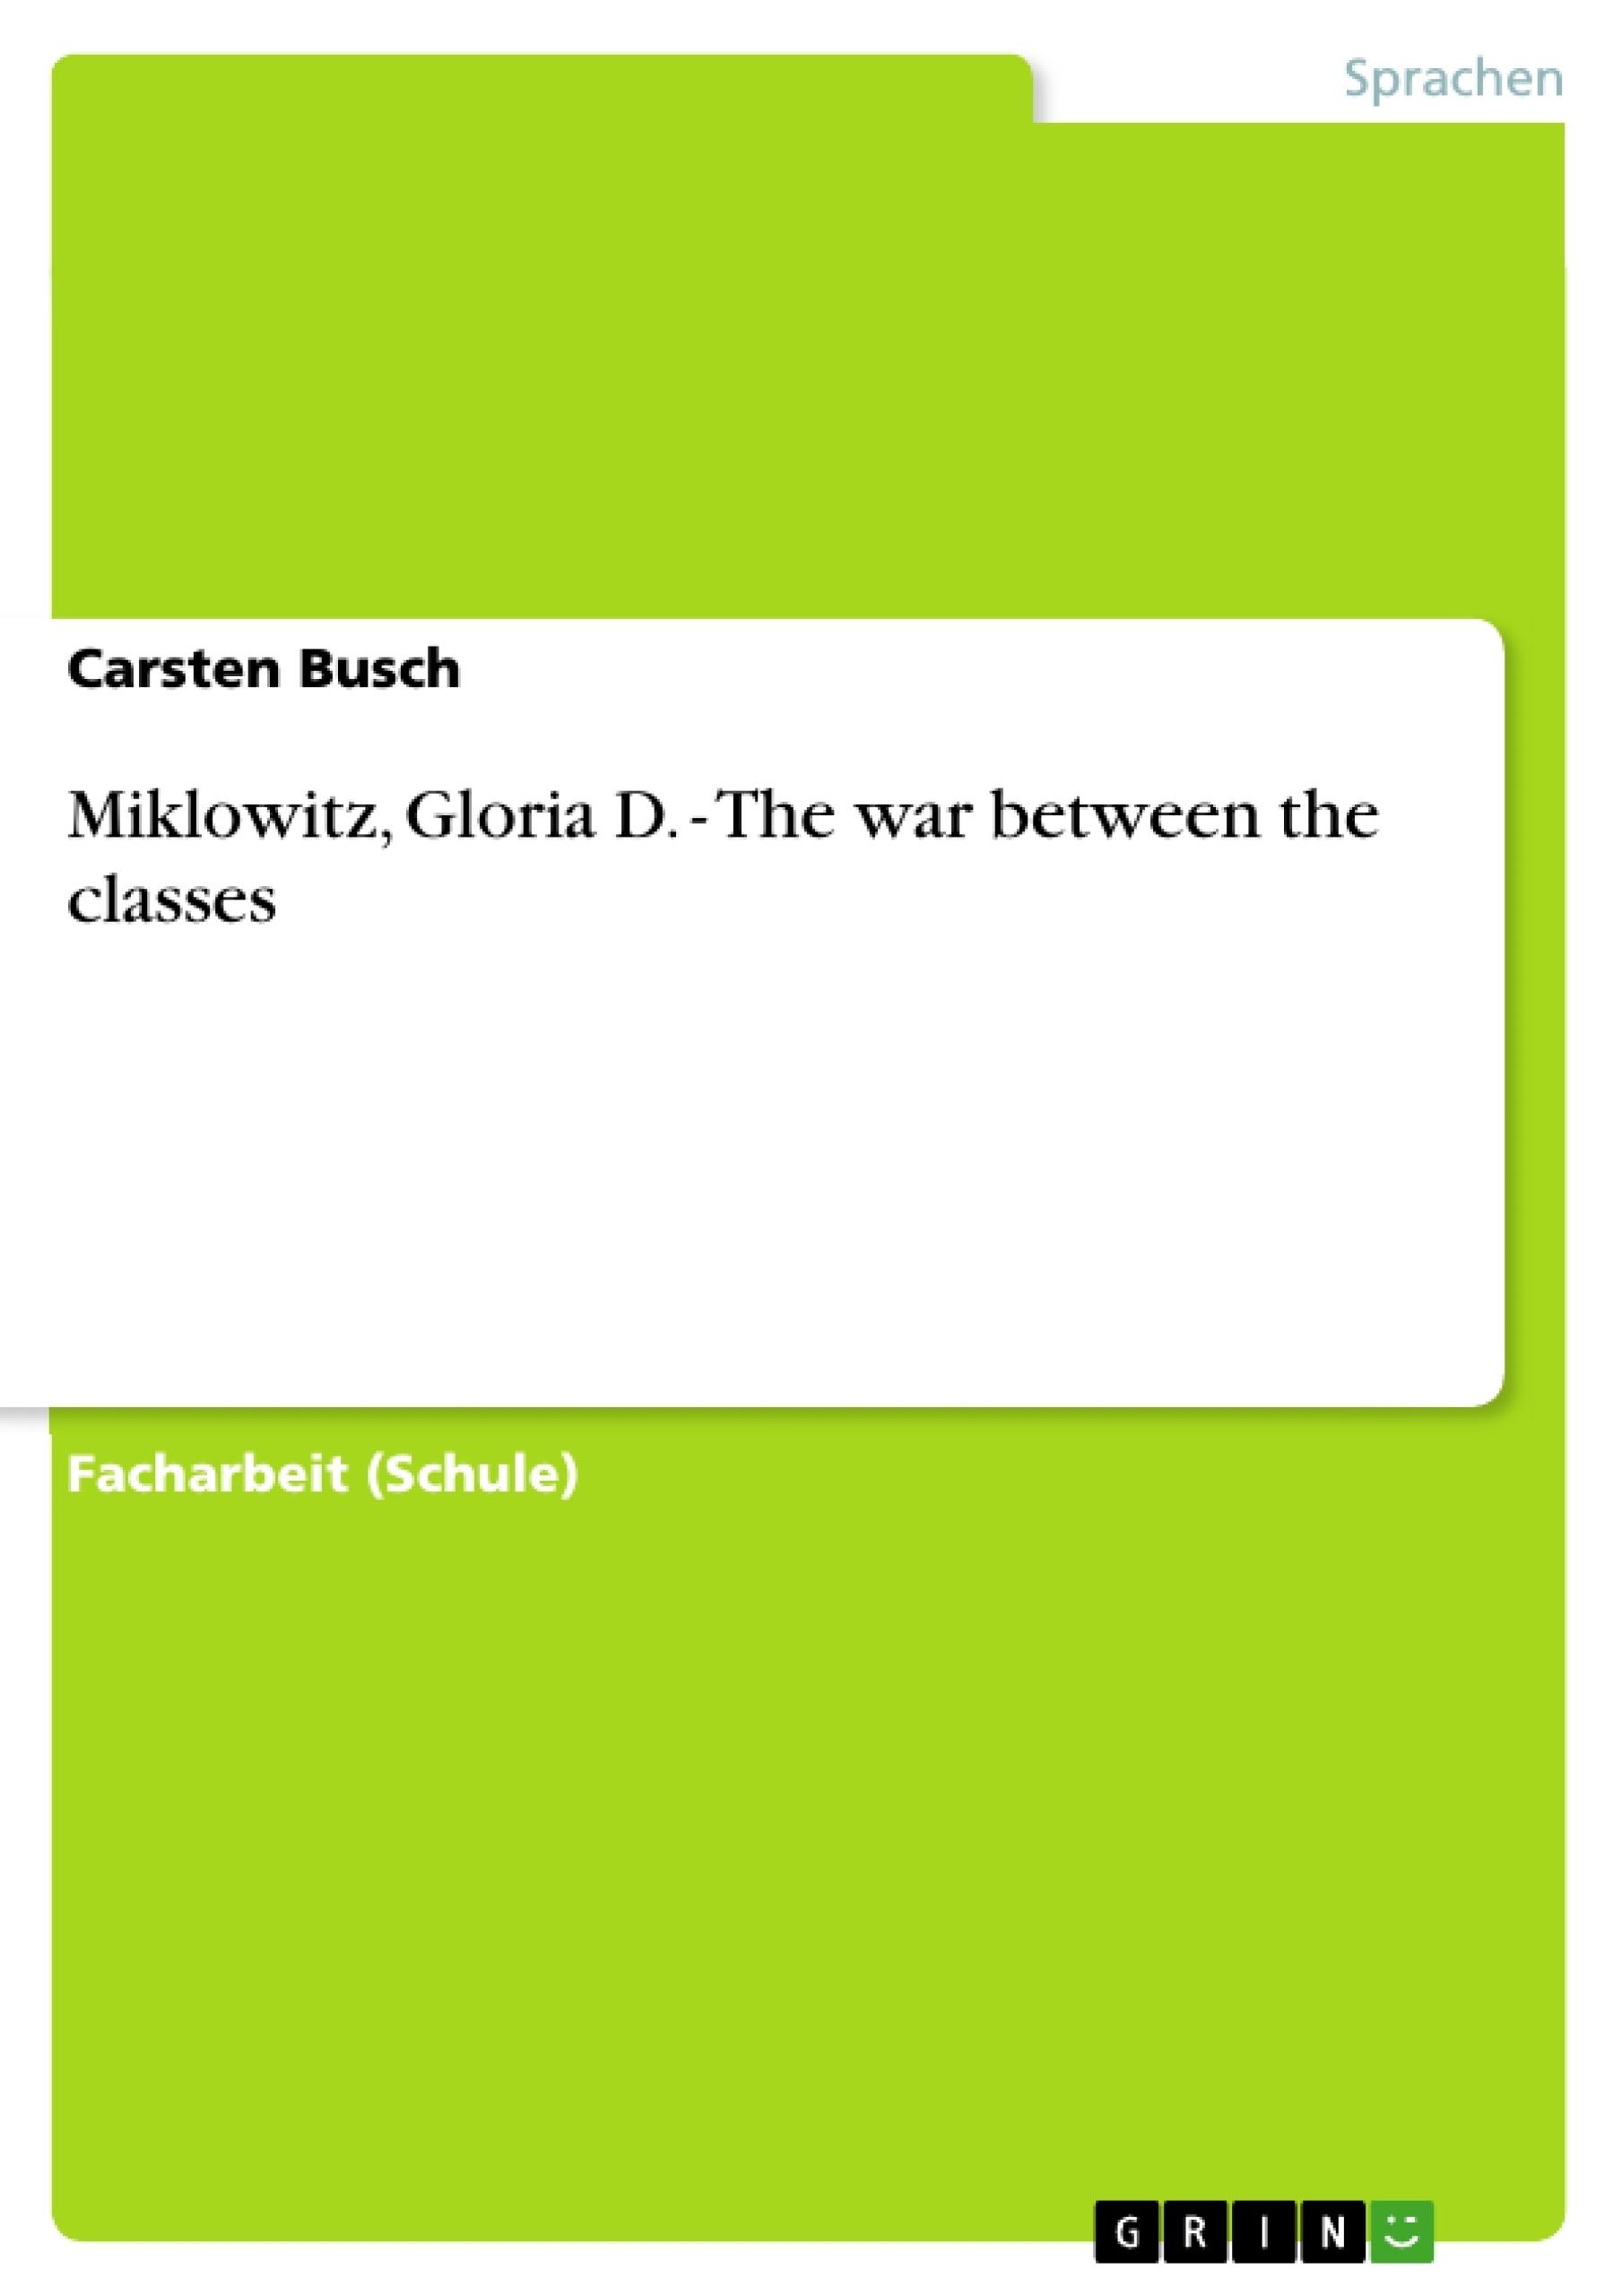 Titel: Miklowitz, Gloria D. - The war between the classes